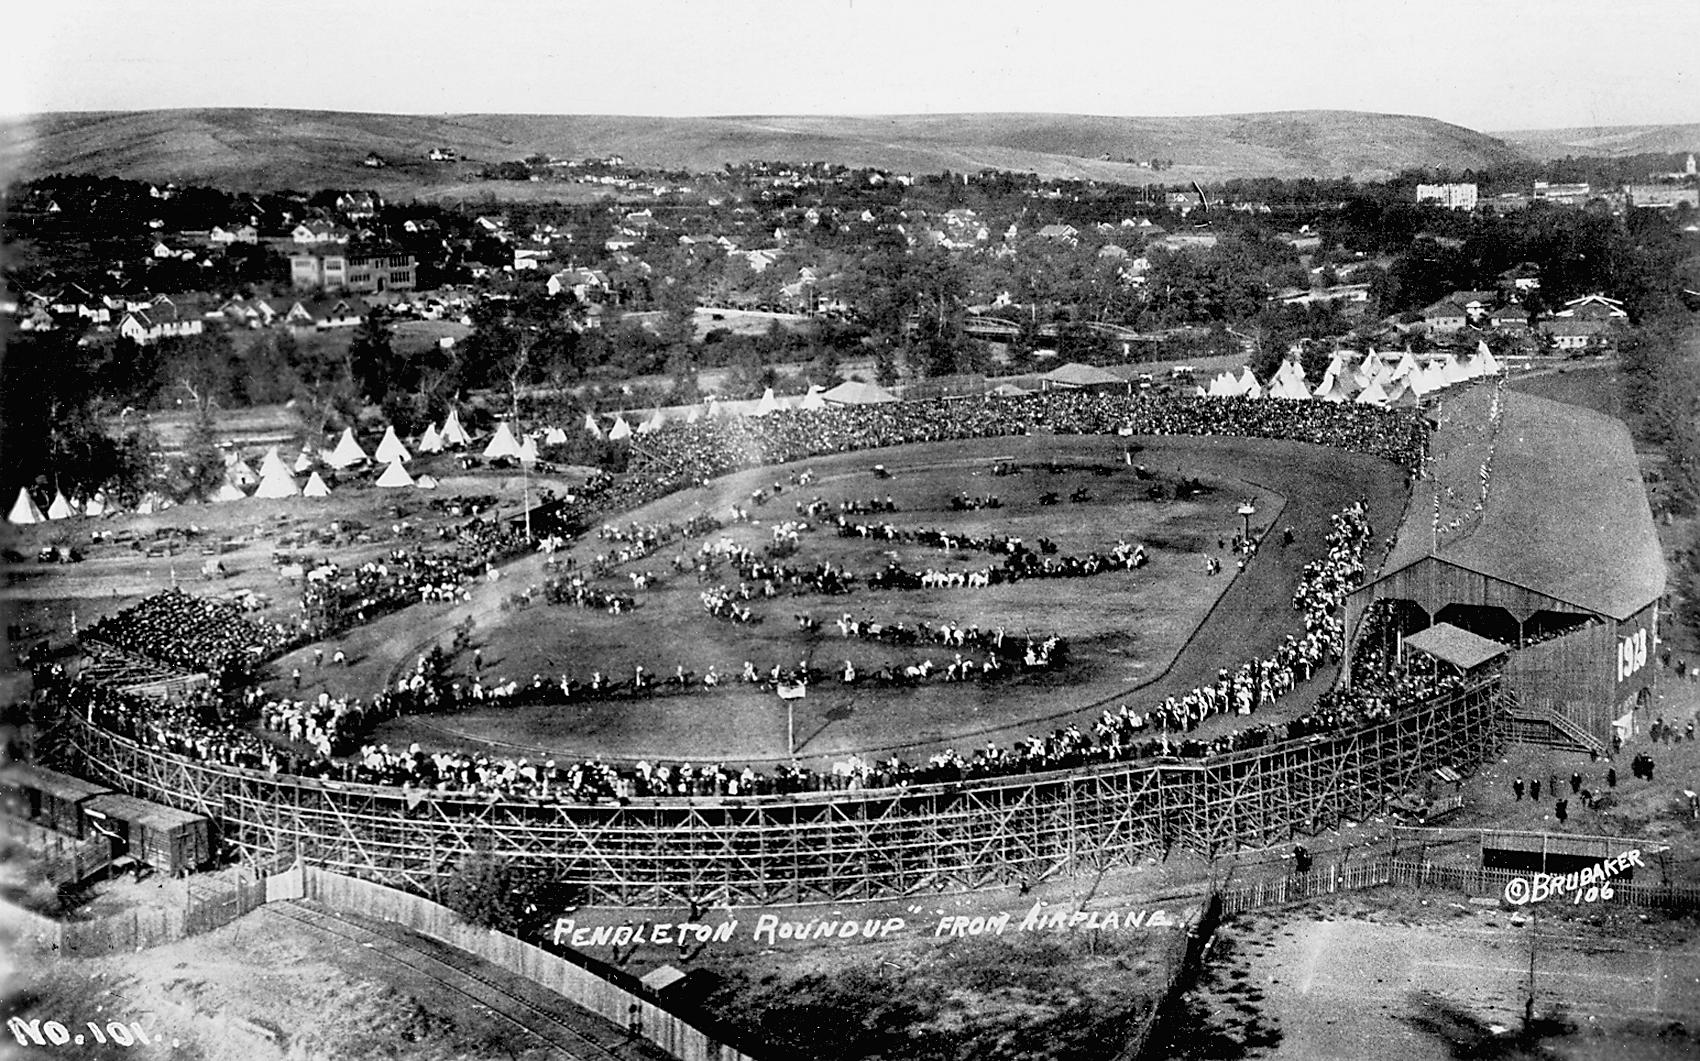 Pendleton Round-Up at 100 : Oregon's Legendary Rodeo (2010, SB) Cowboys History